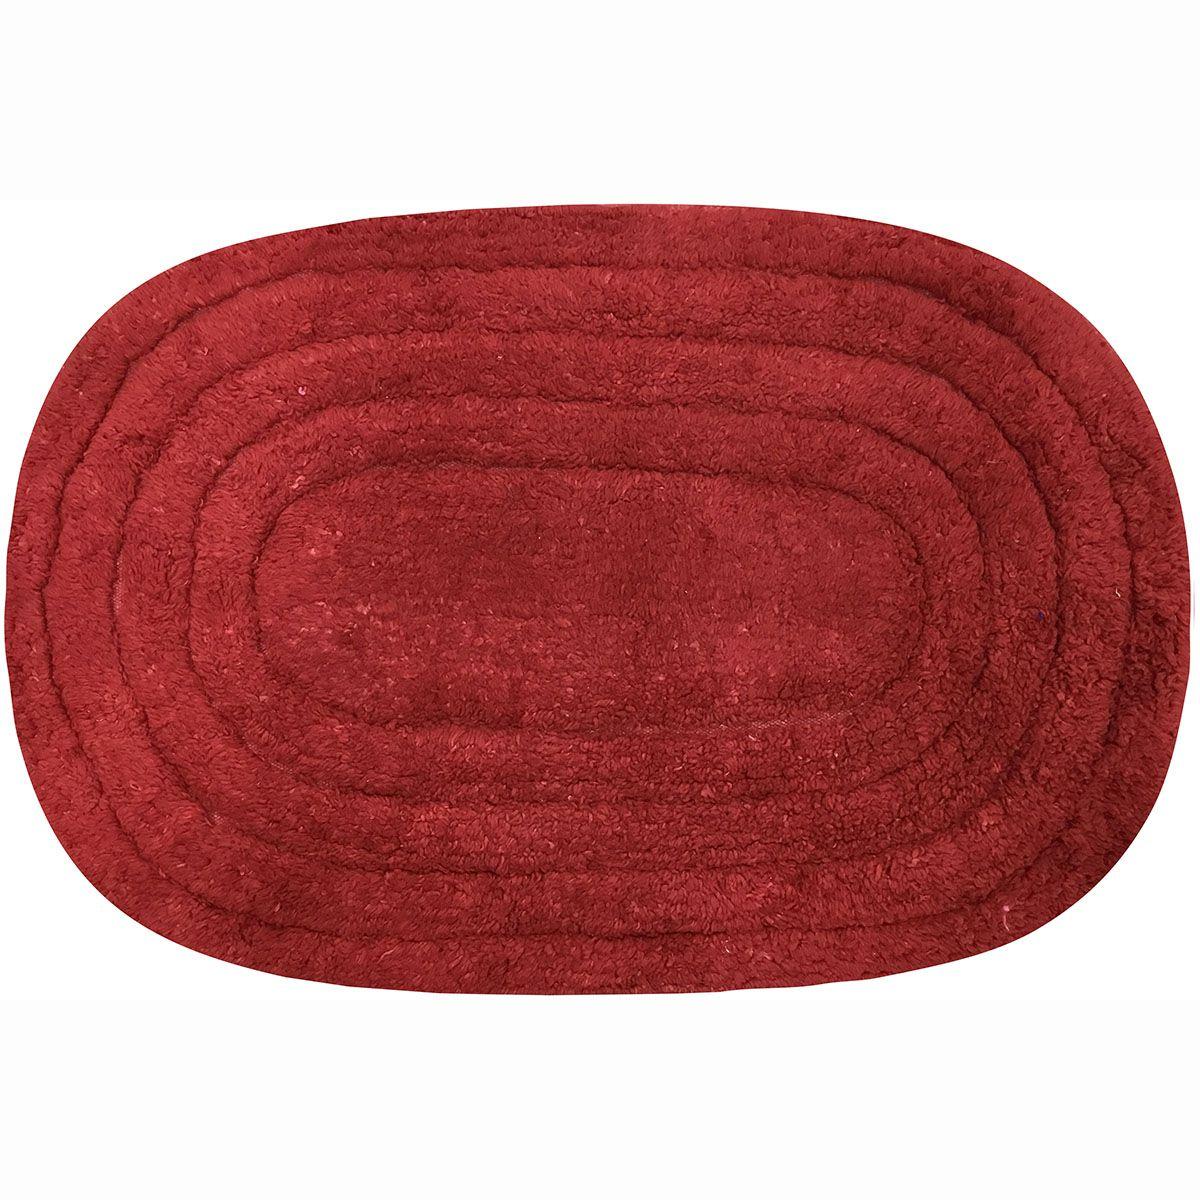 Tapete de Banheiro - Oval - Michigan - 60cm x 40cm - Vermelho - Niazitex